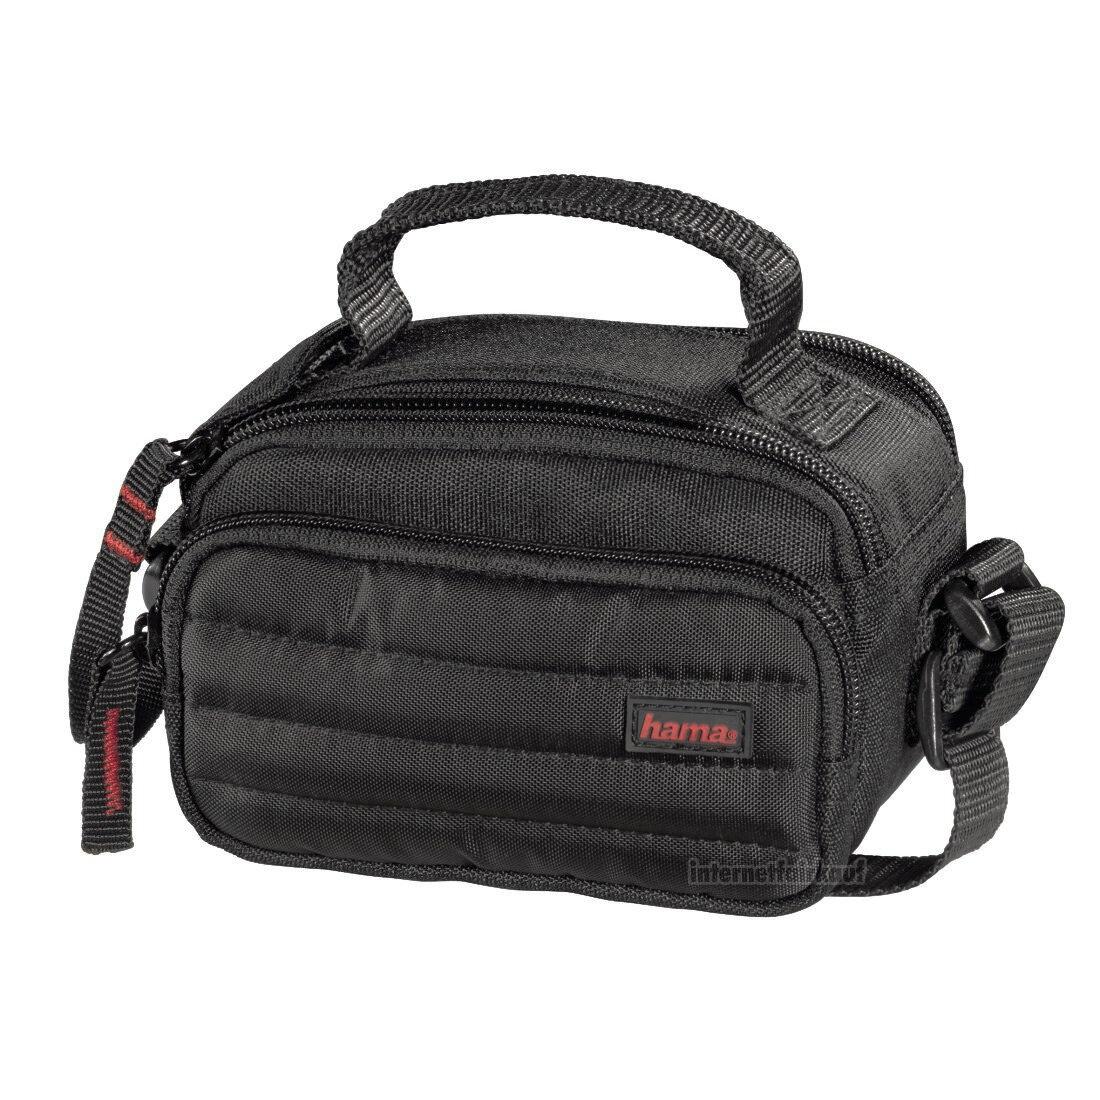 Kameratasche Fototasche passend für Panasonic Lumix DMC-TZ101 DMC-TZ202